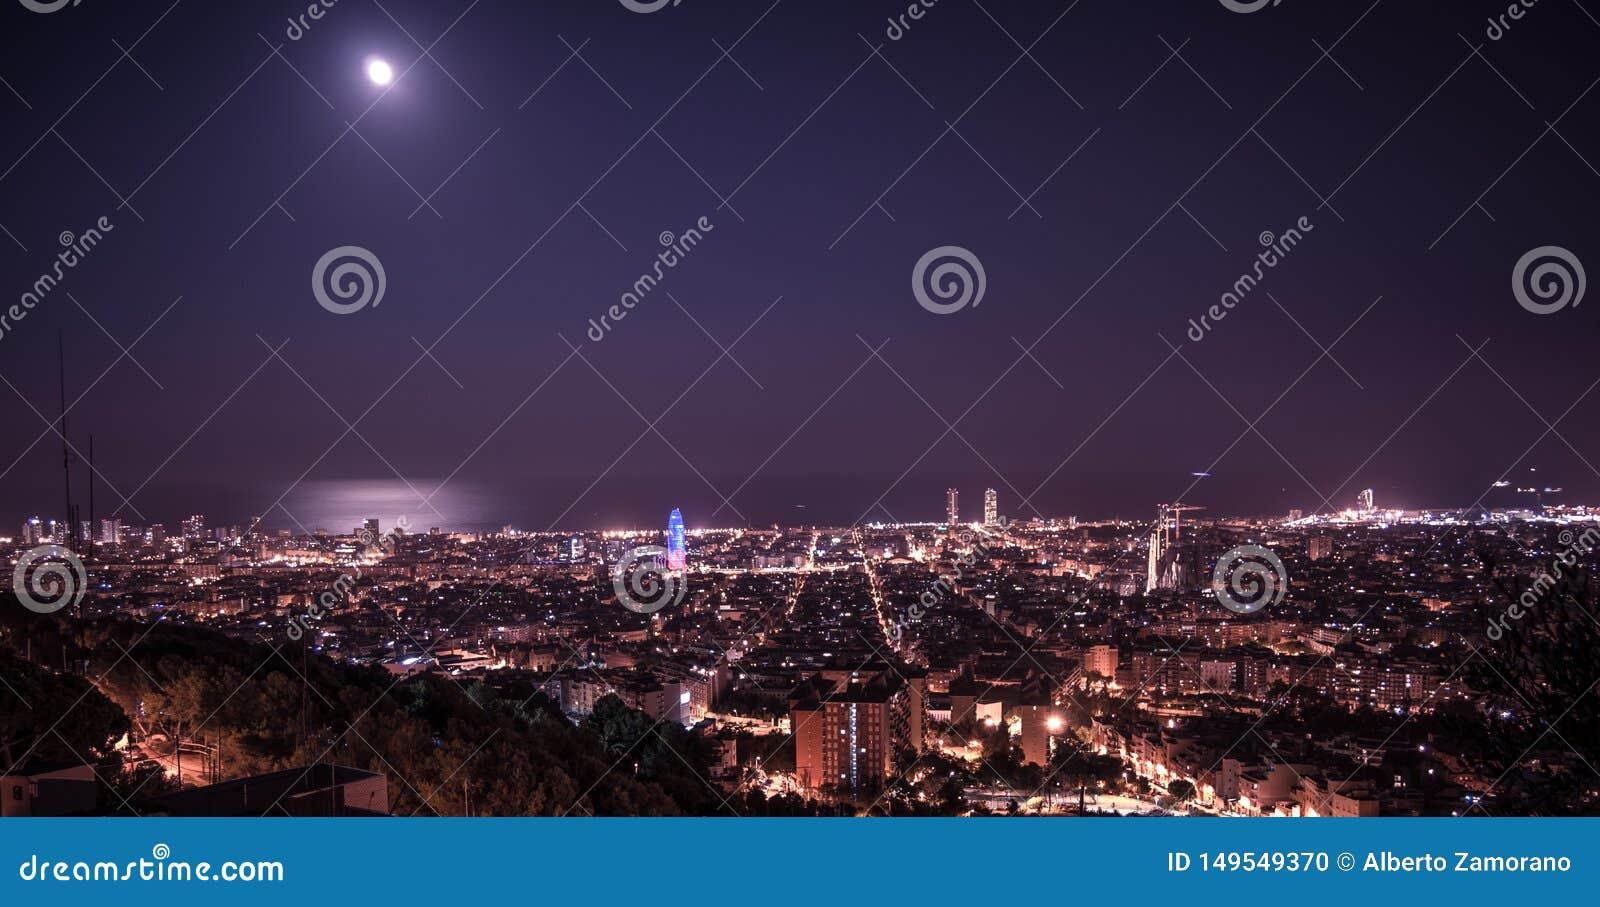 Barcelona skyline panorama at night from Turo Rovira, Catalonia, Spain